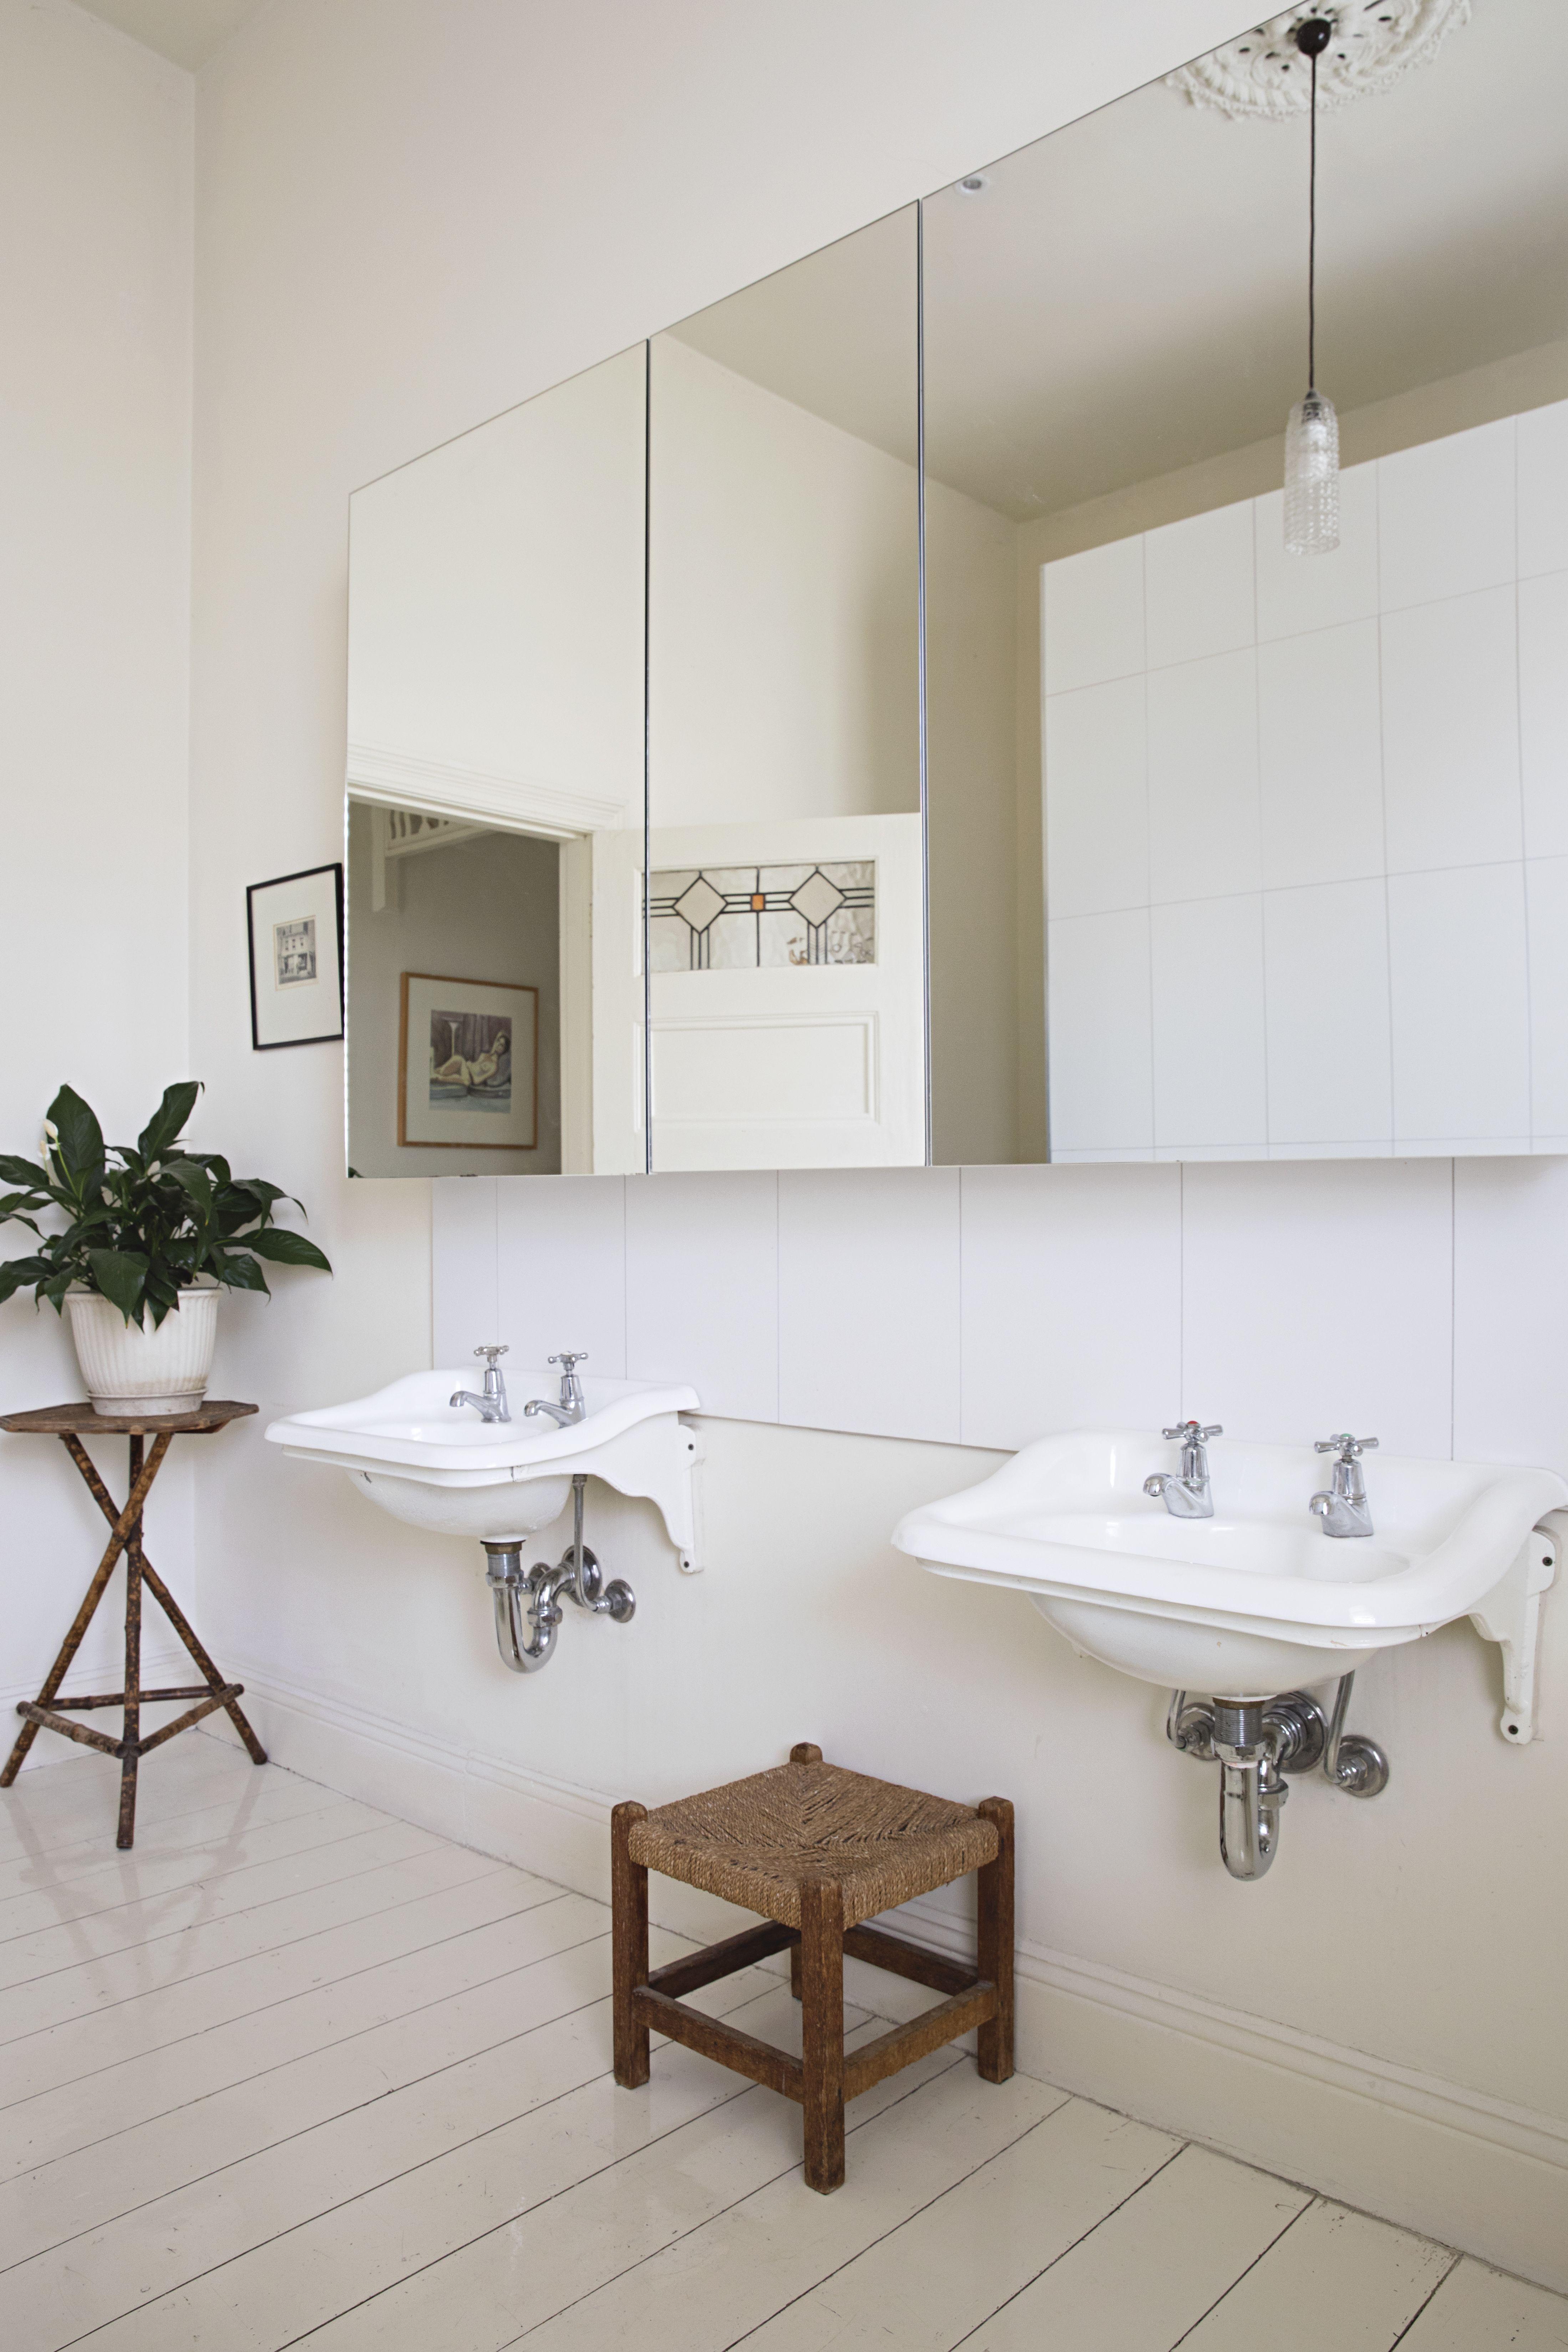 modern architecture remodel ideas australia house tour on bathroom renovation ideas australia id=47099